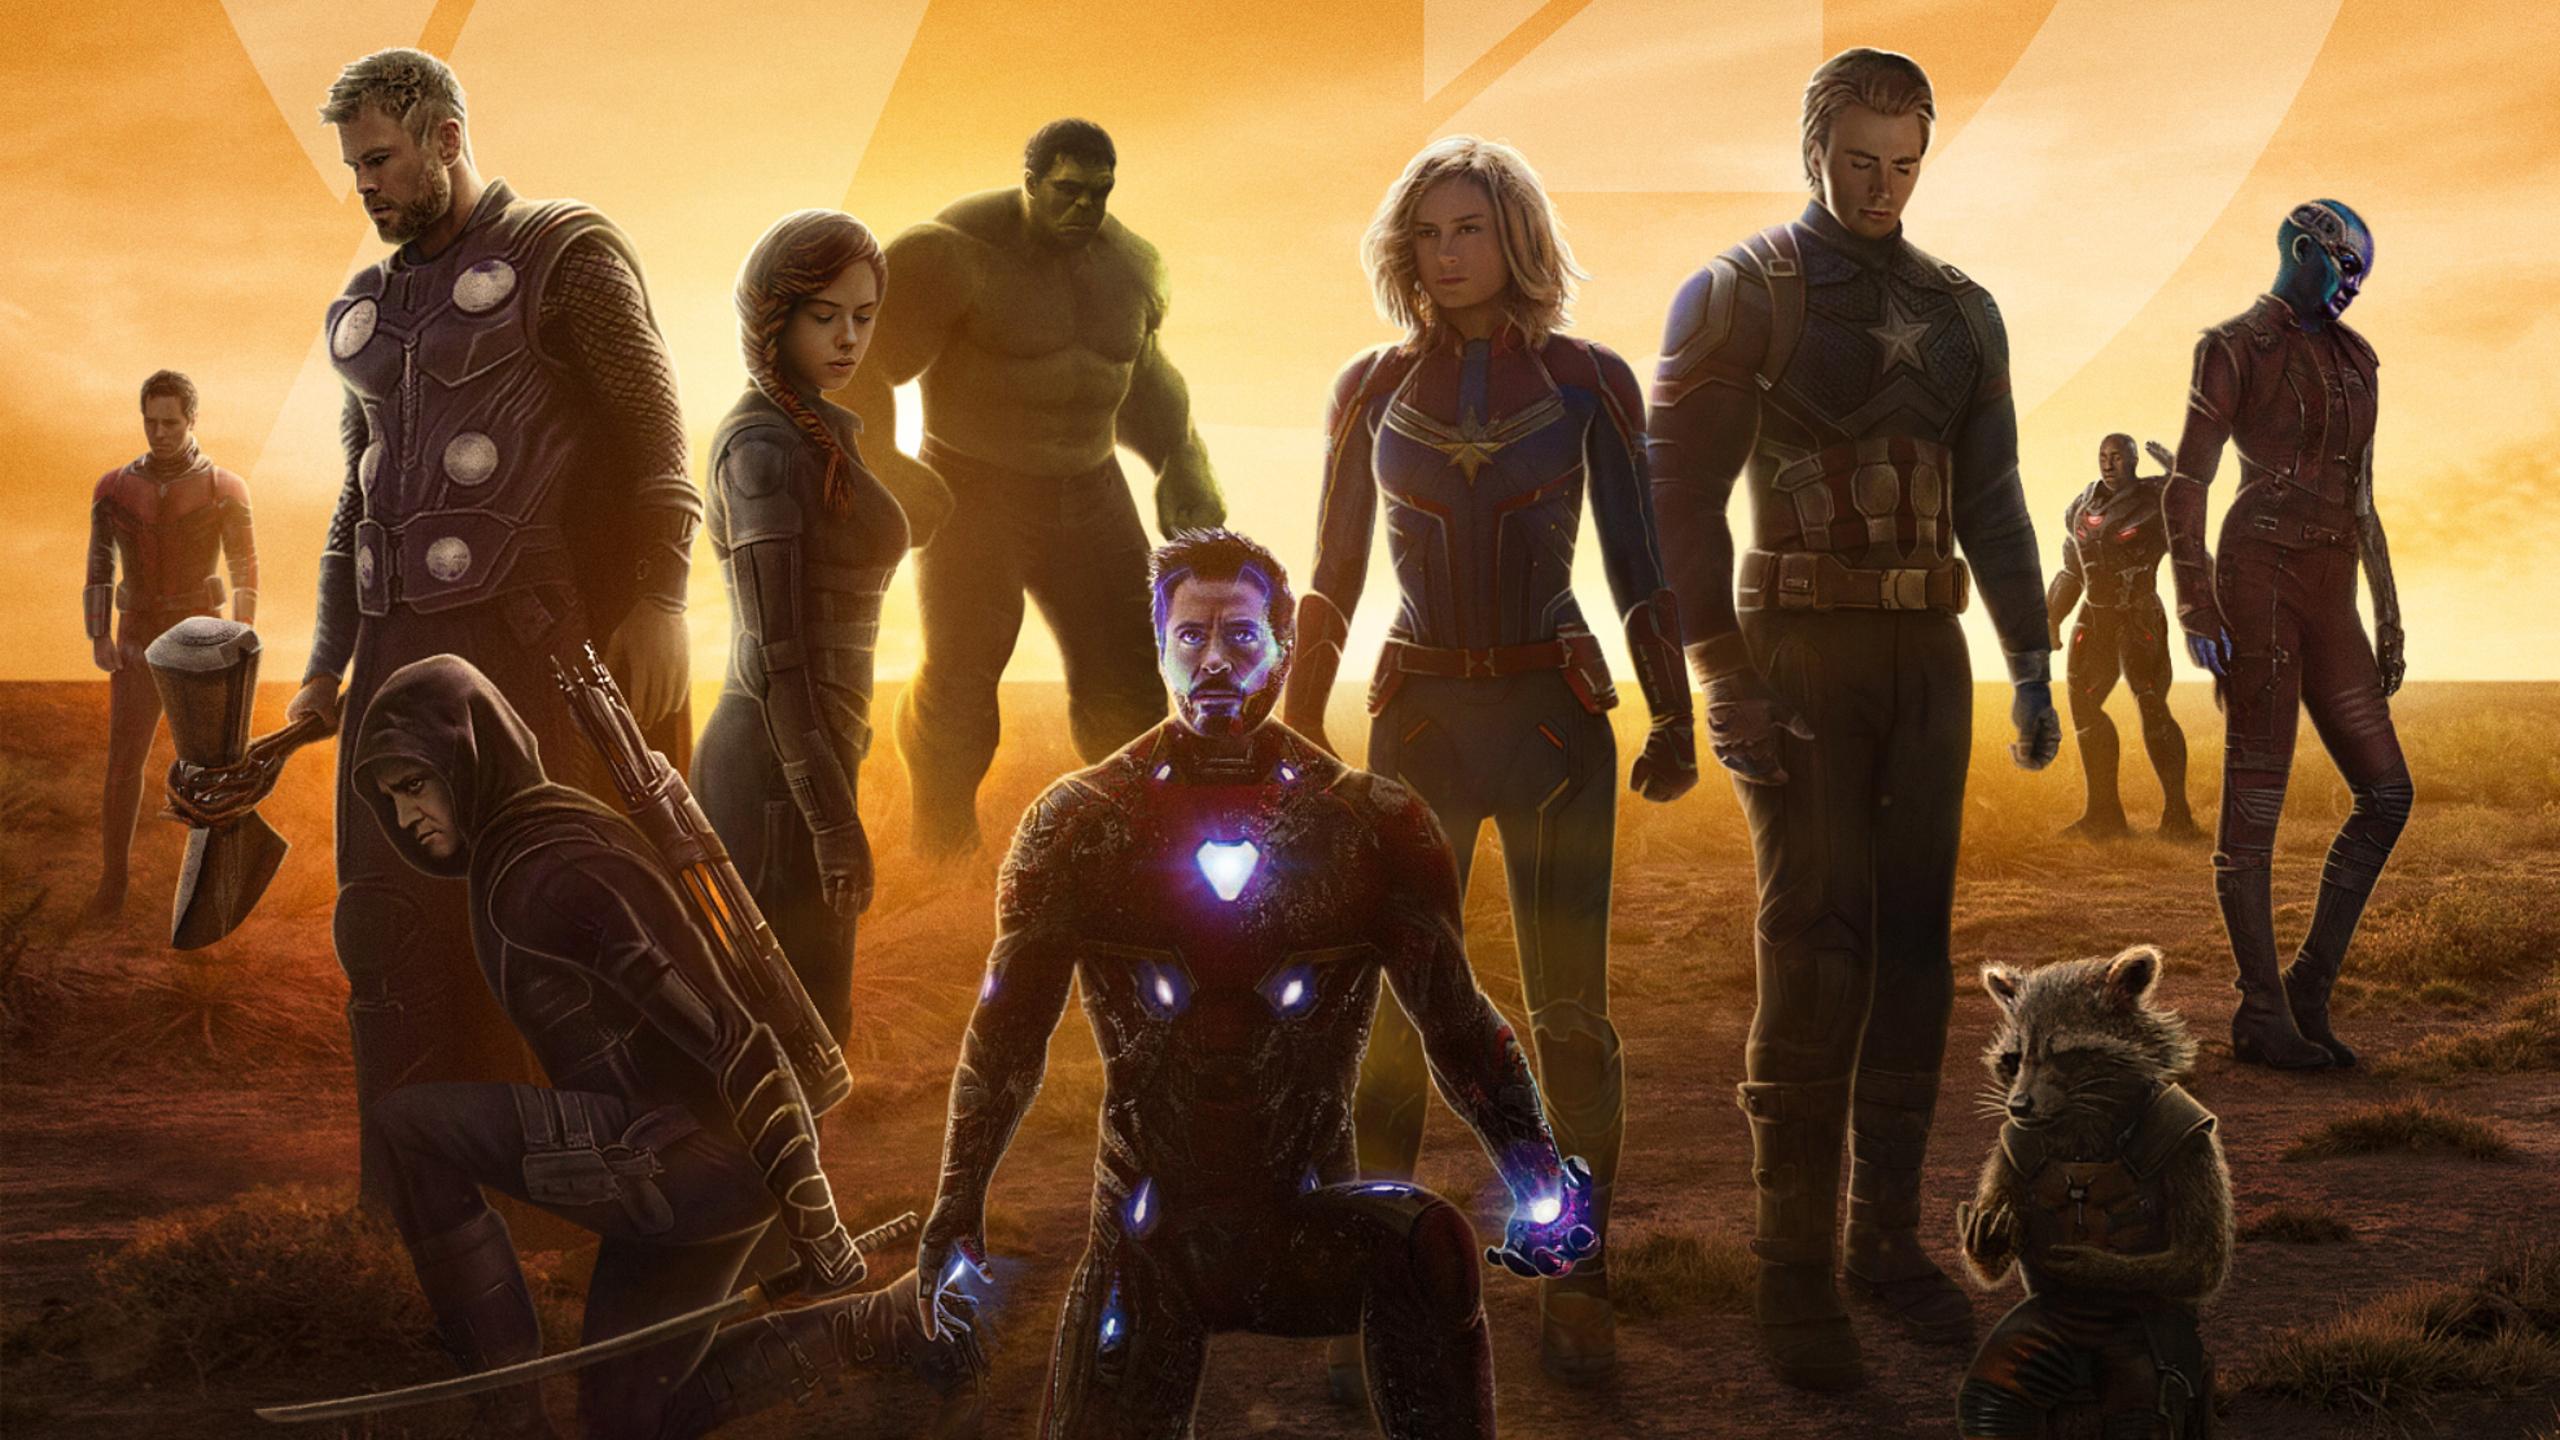 2560x1440 Avengers Endgame 2019 Movie 1440P Resolution HD ...